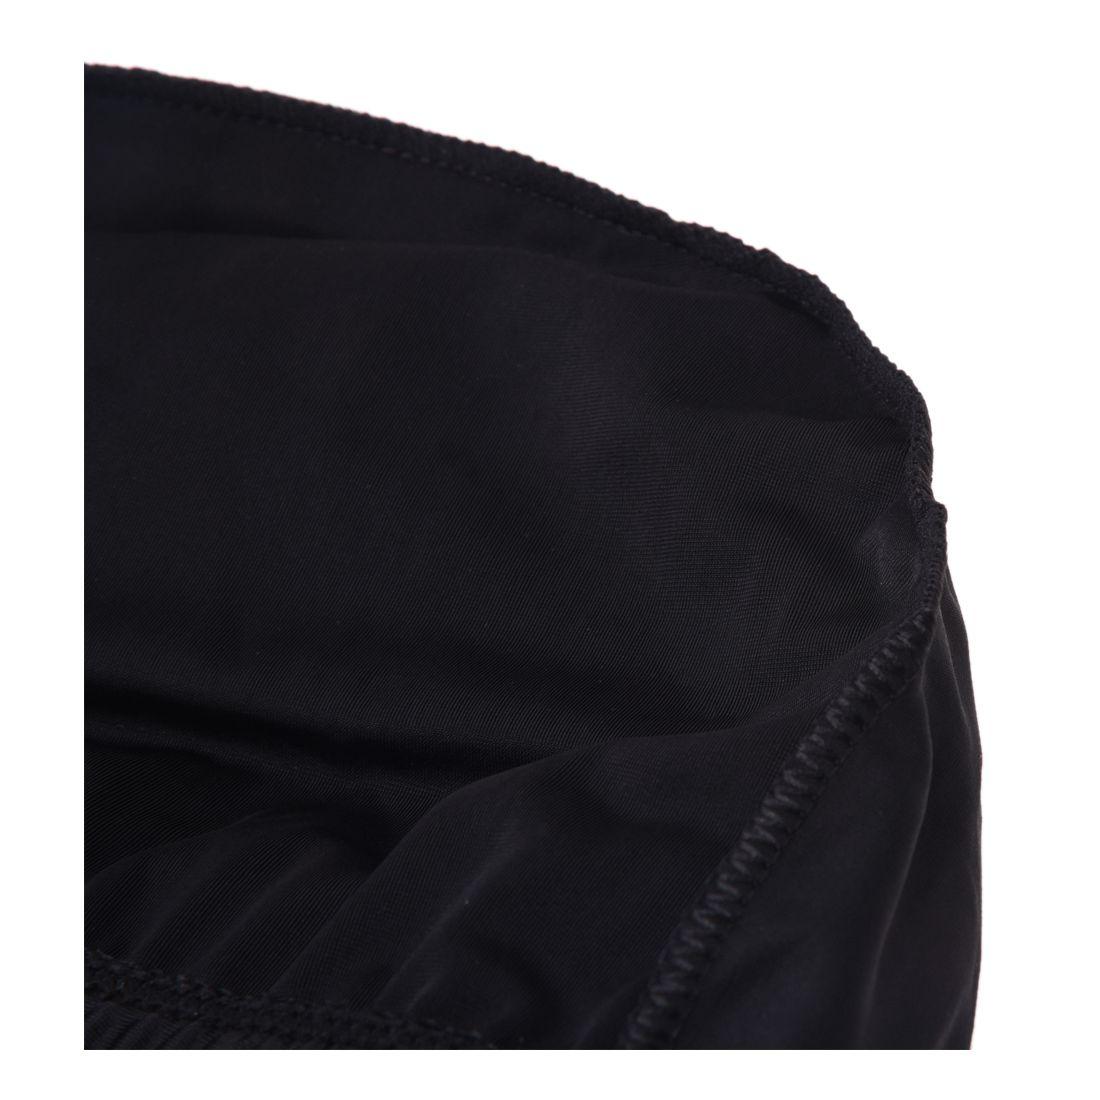 Woman Man Polyester Elastic Swimming Bathing Hat Cap Black W8J8